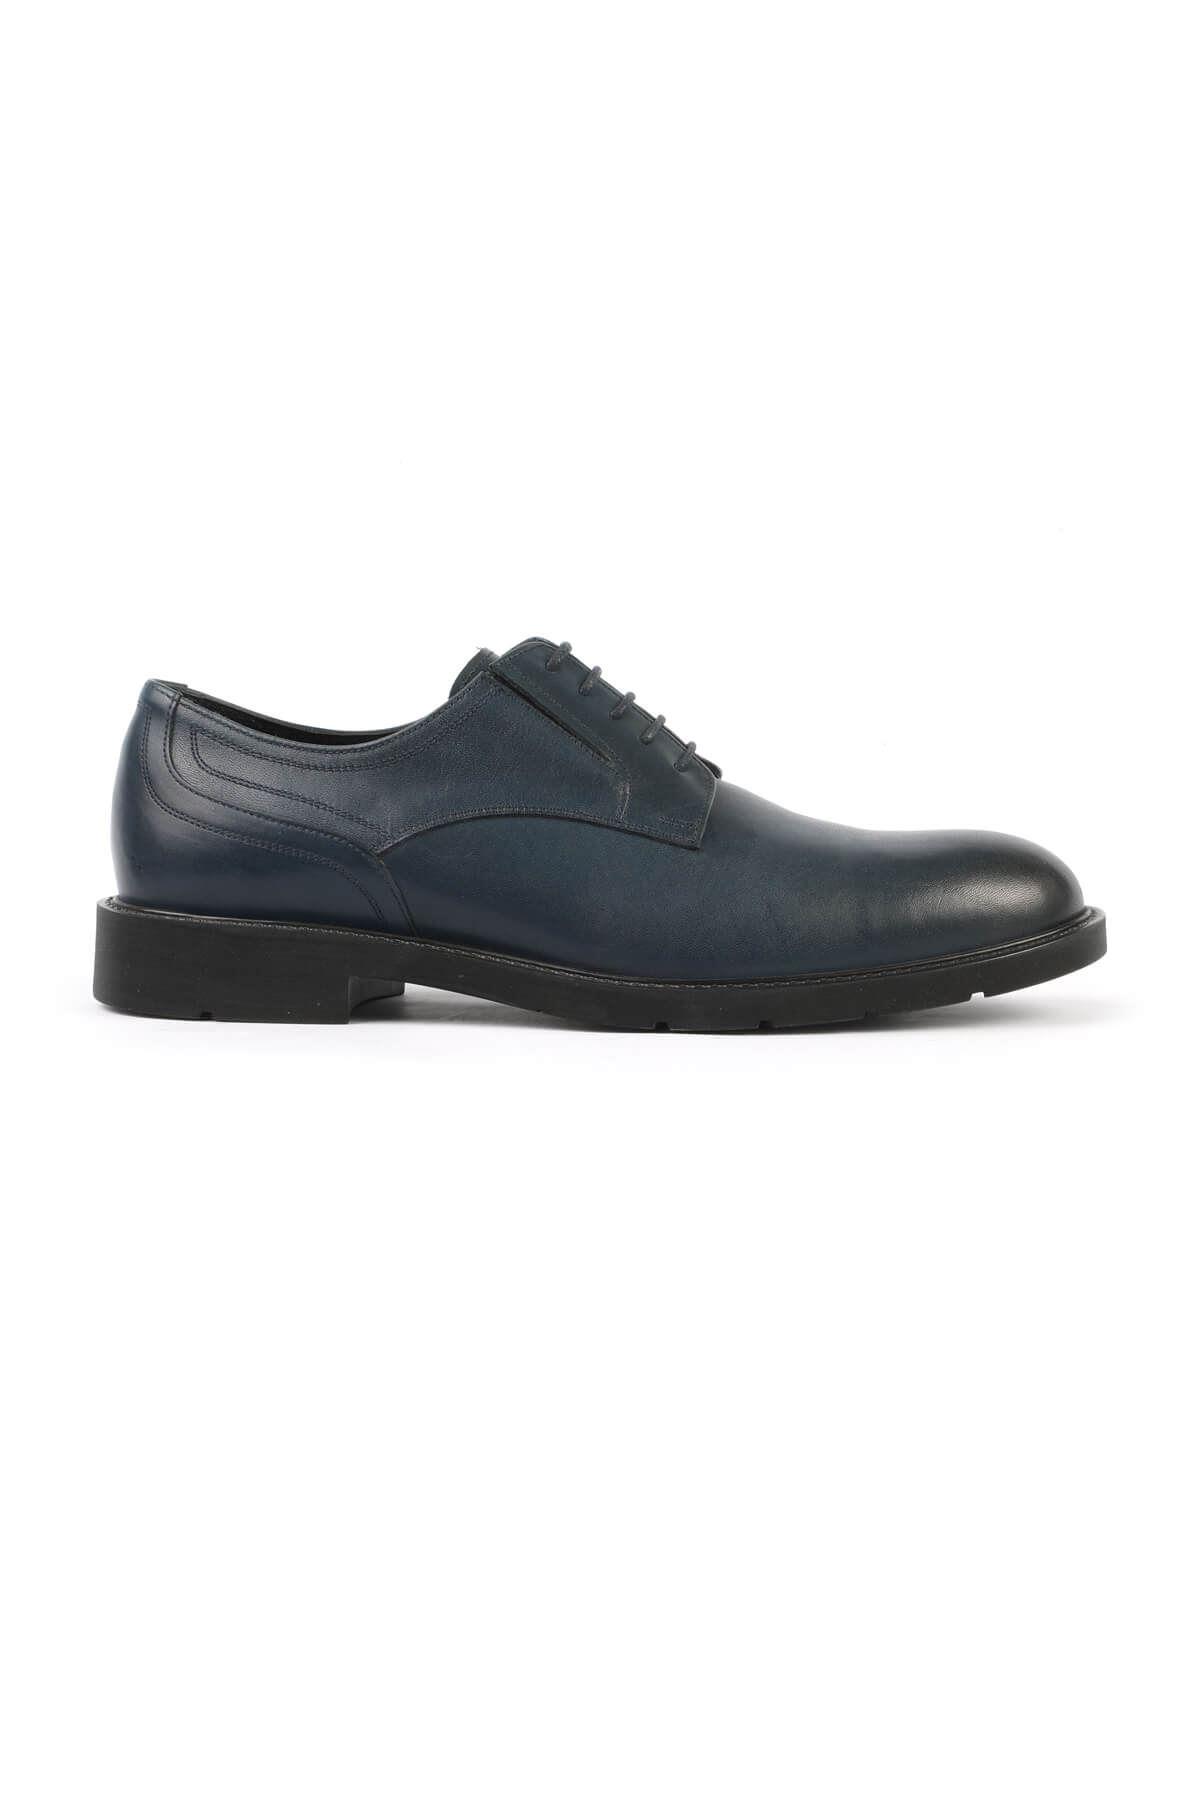 Libero 2922 Navy Blue Casual Shoes